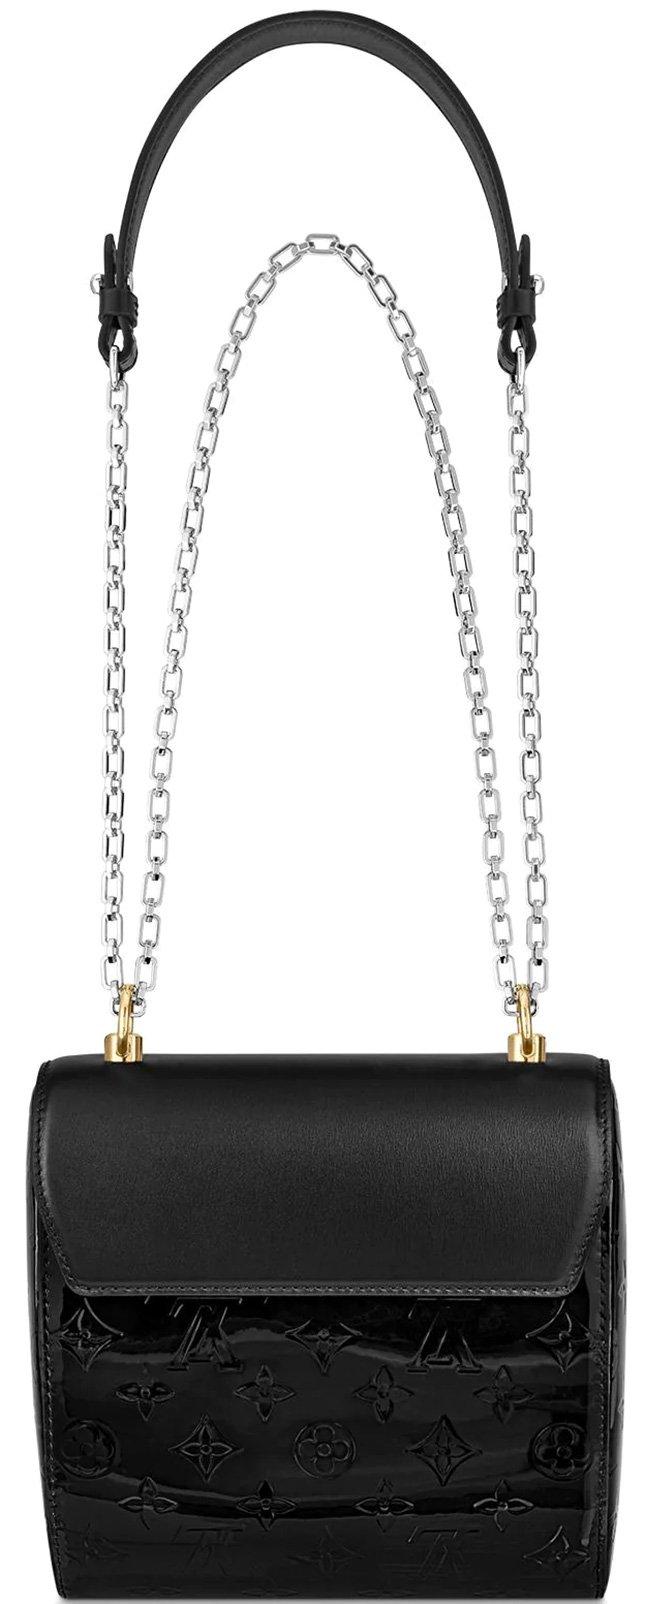 Louis Vuitton Pochette Twist Bag